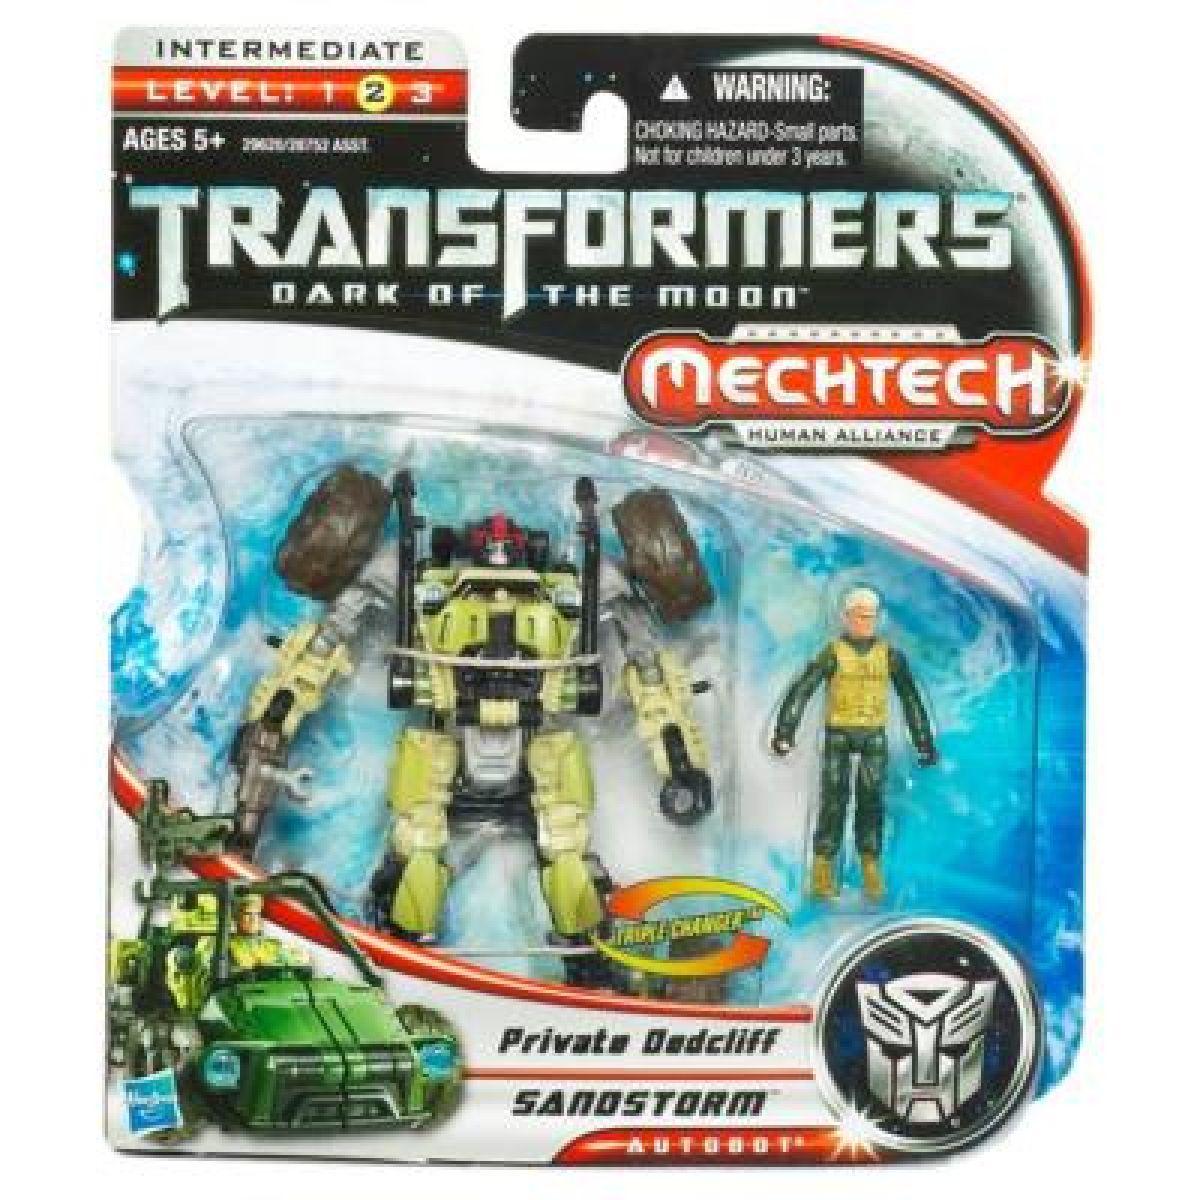 Transformers human alliance základní figurka Hasbro 28752 - Private Dedcliff a Sandstorm